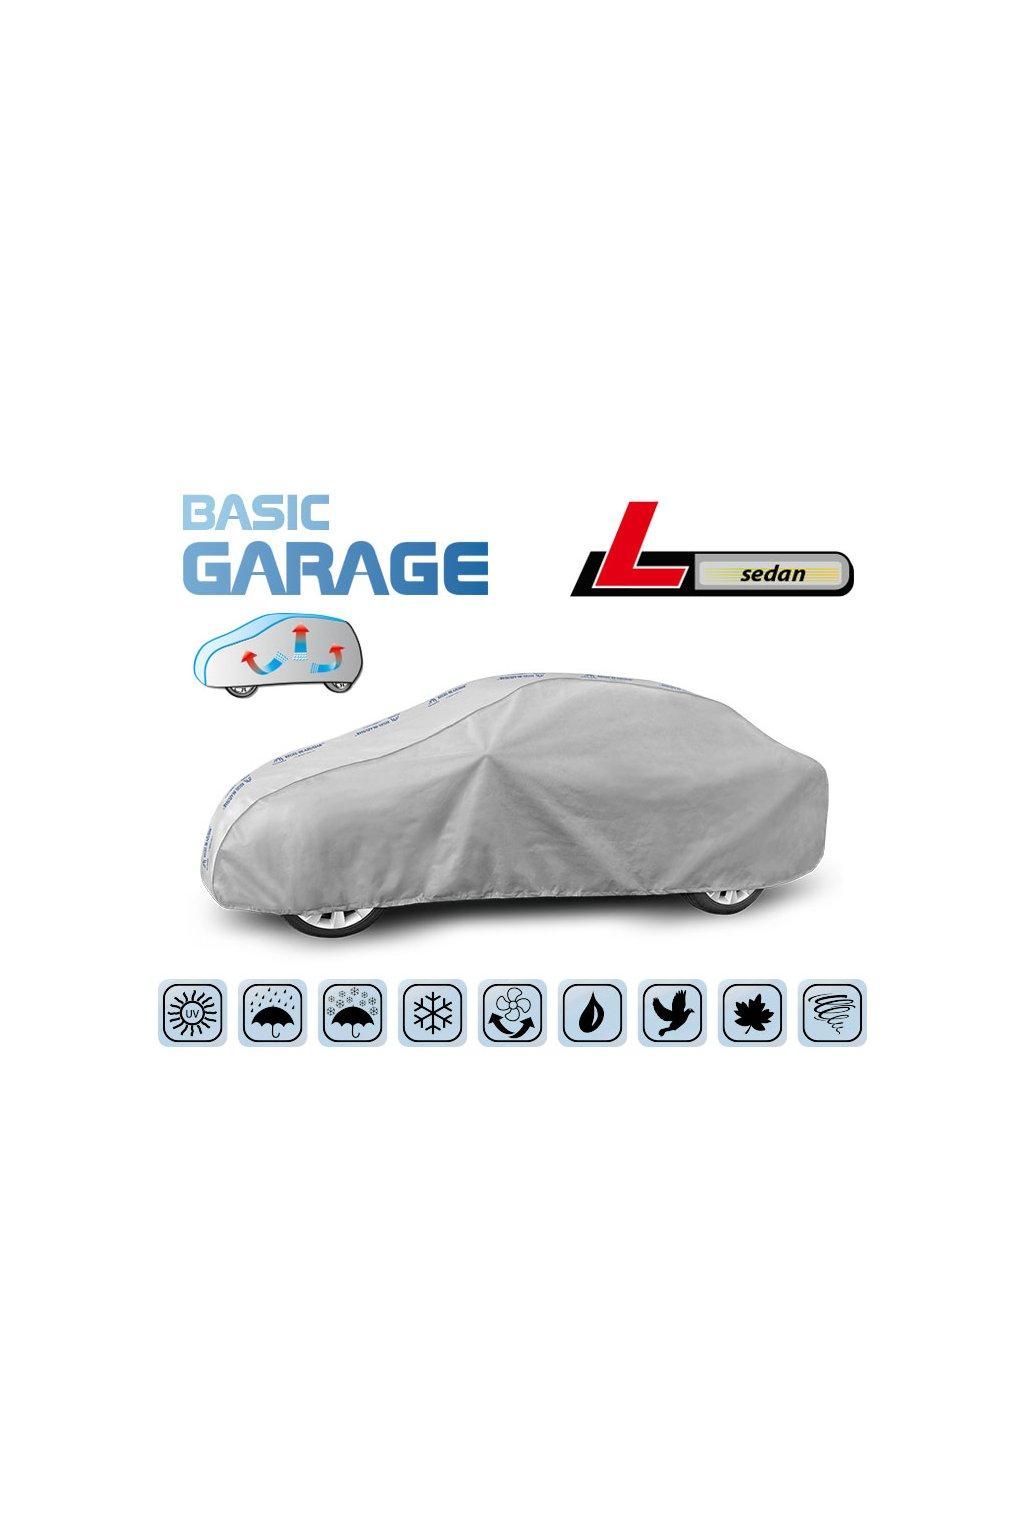 basic garage L sd 3 art 5 3963 241 3021